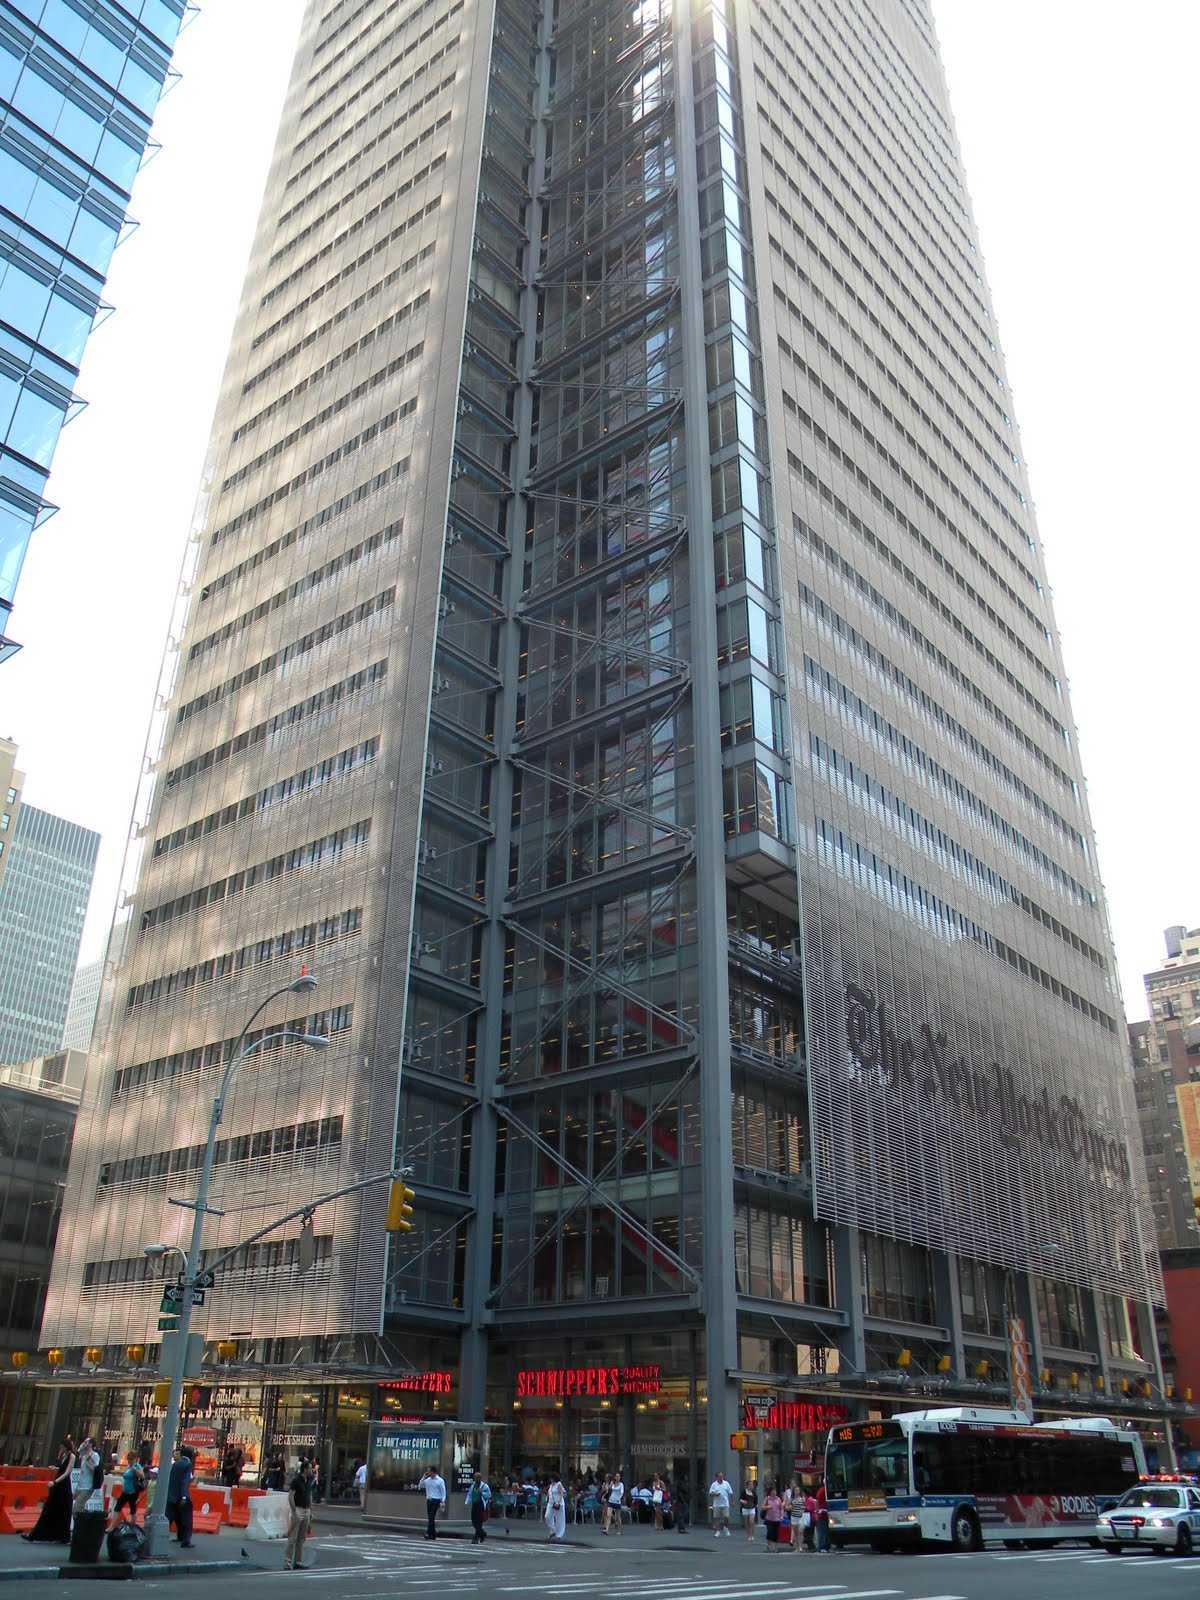 New York Times Building Public Domain Clip Art Photos and ...